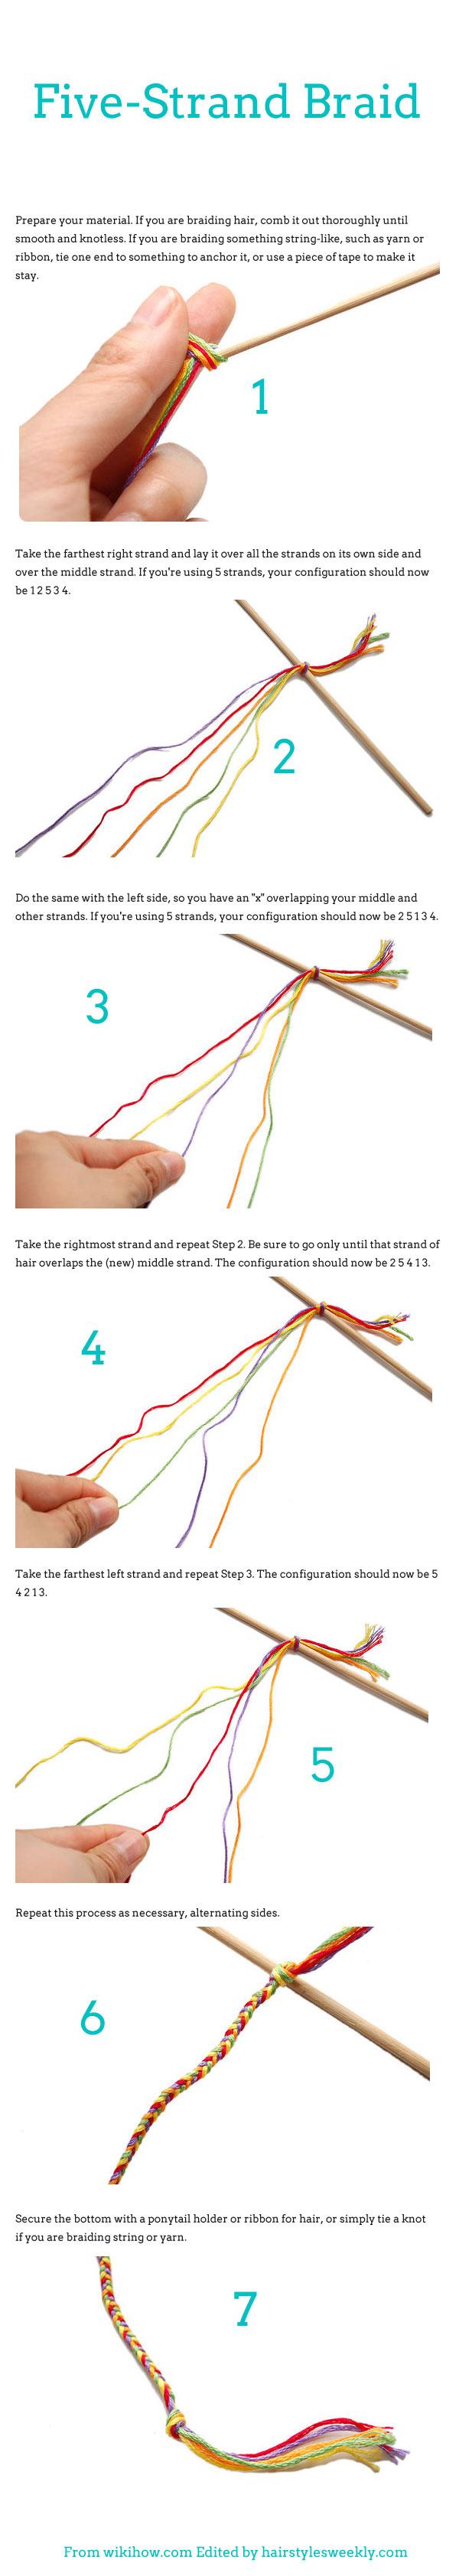 DIY: How To Braid Five Strand Braid Hairstyles - Hairstyles